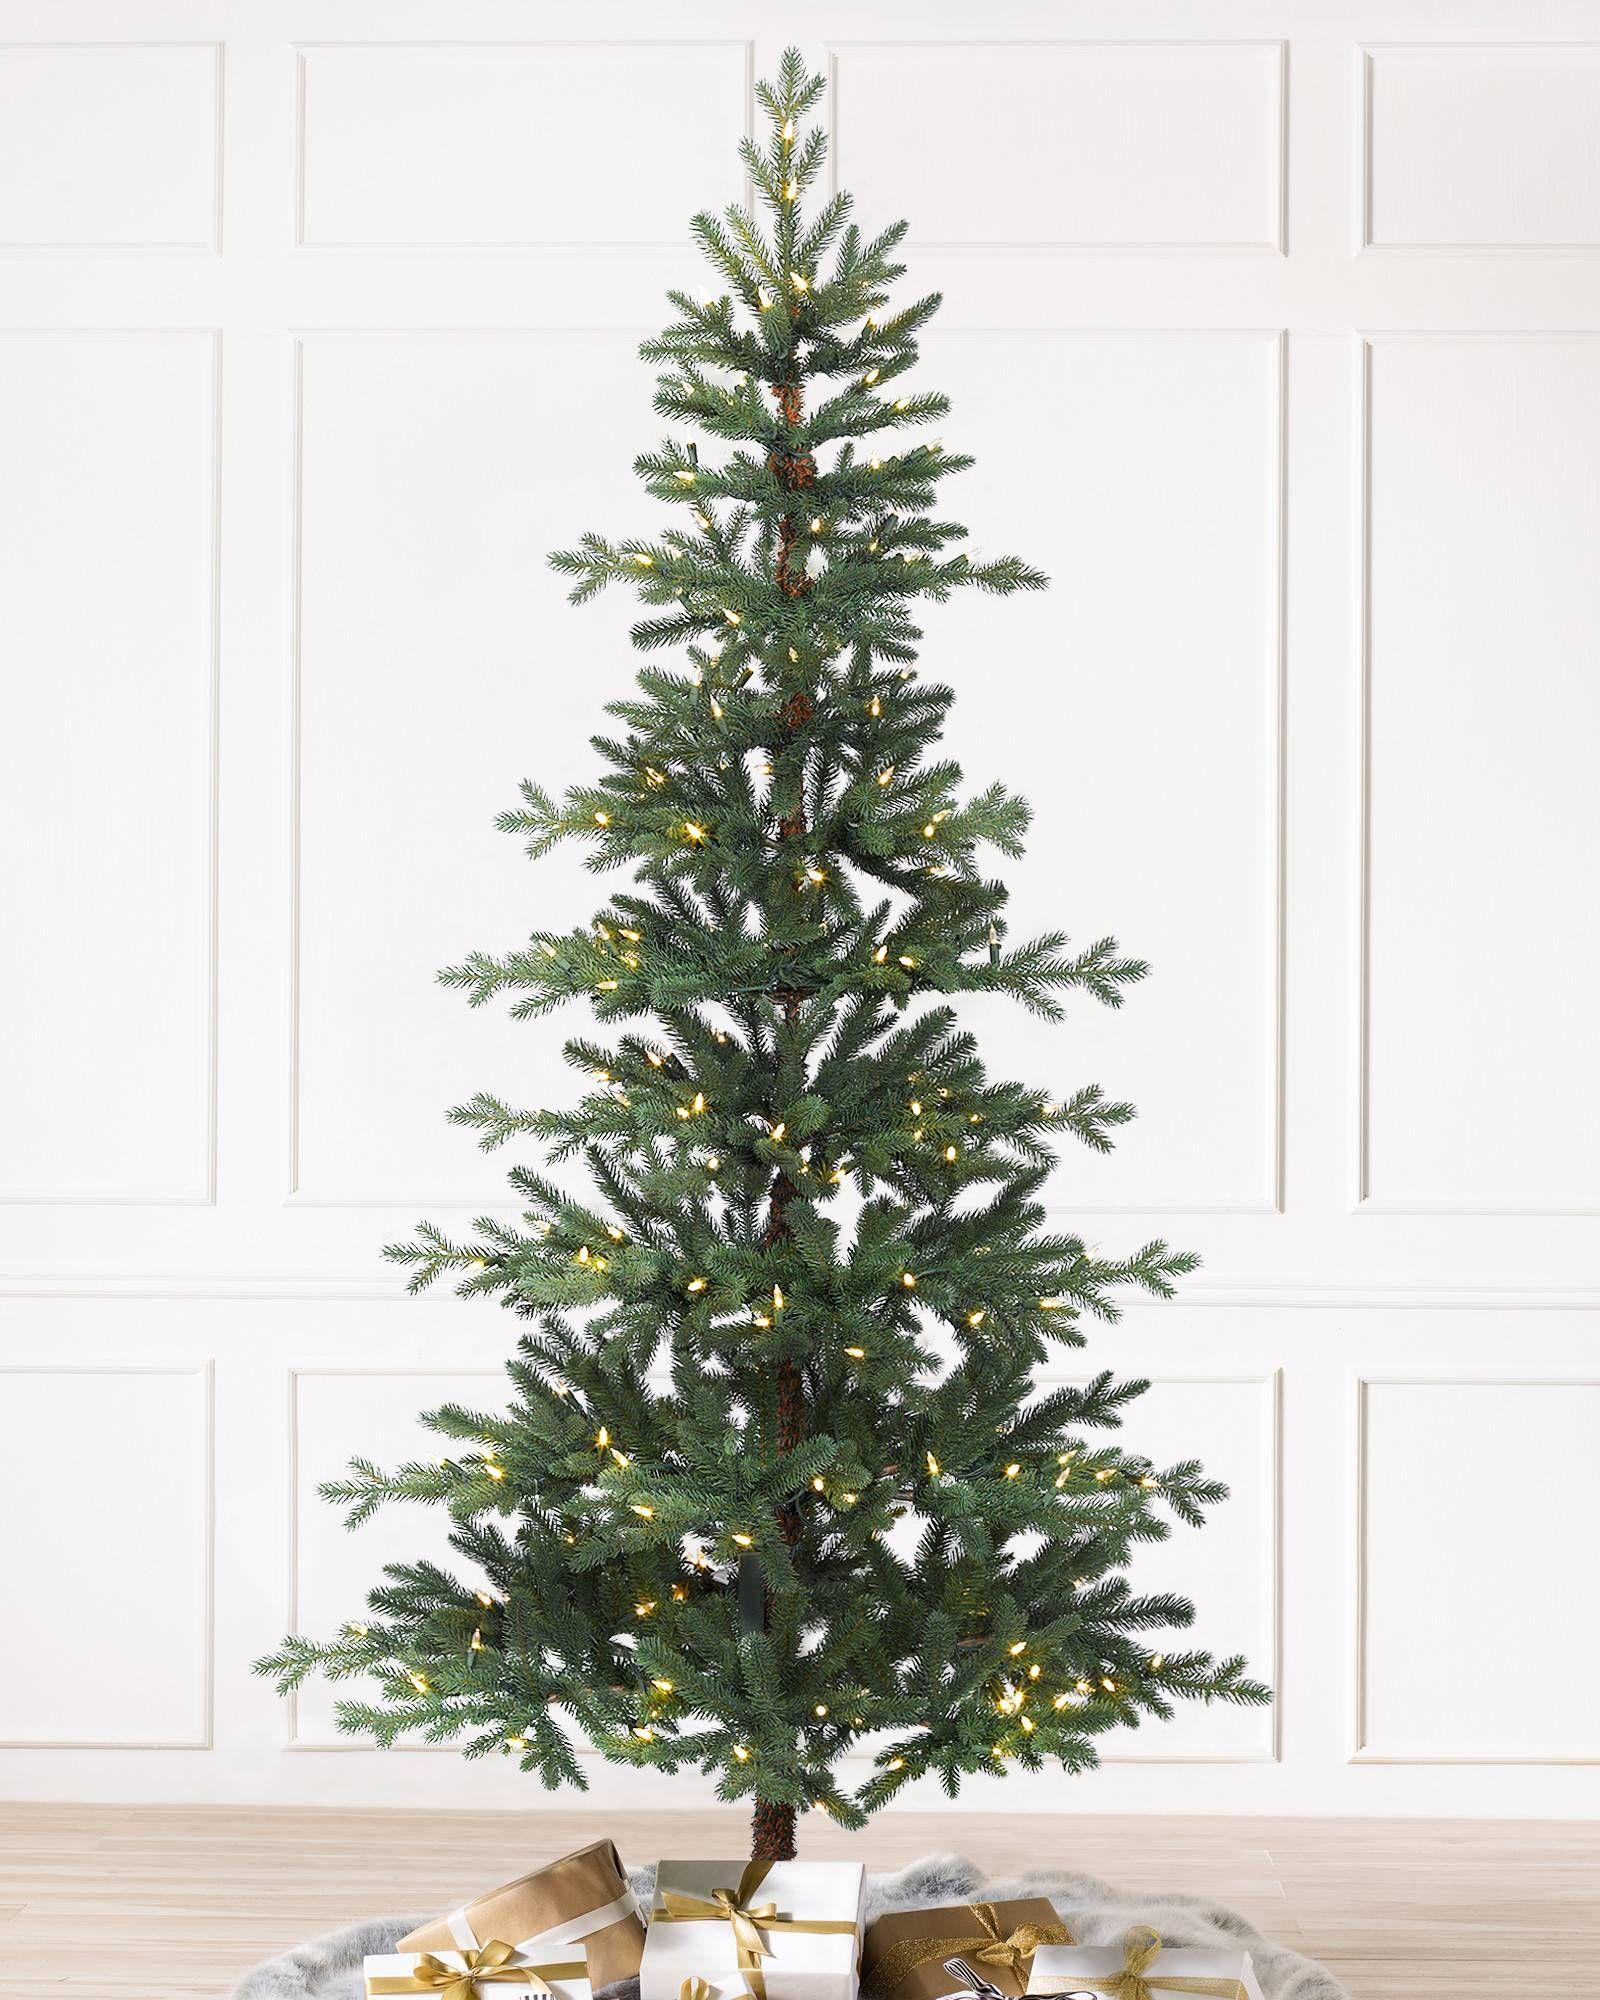 Where To Buy Balsam Hill Christmas Trees: Alpine Artificial Christmas Tree